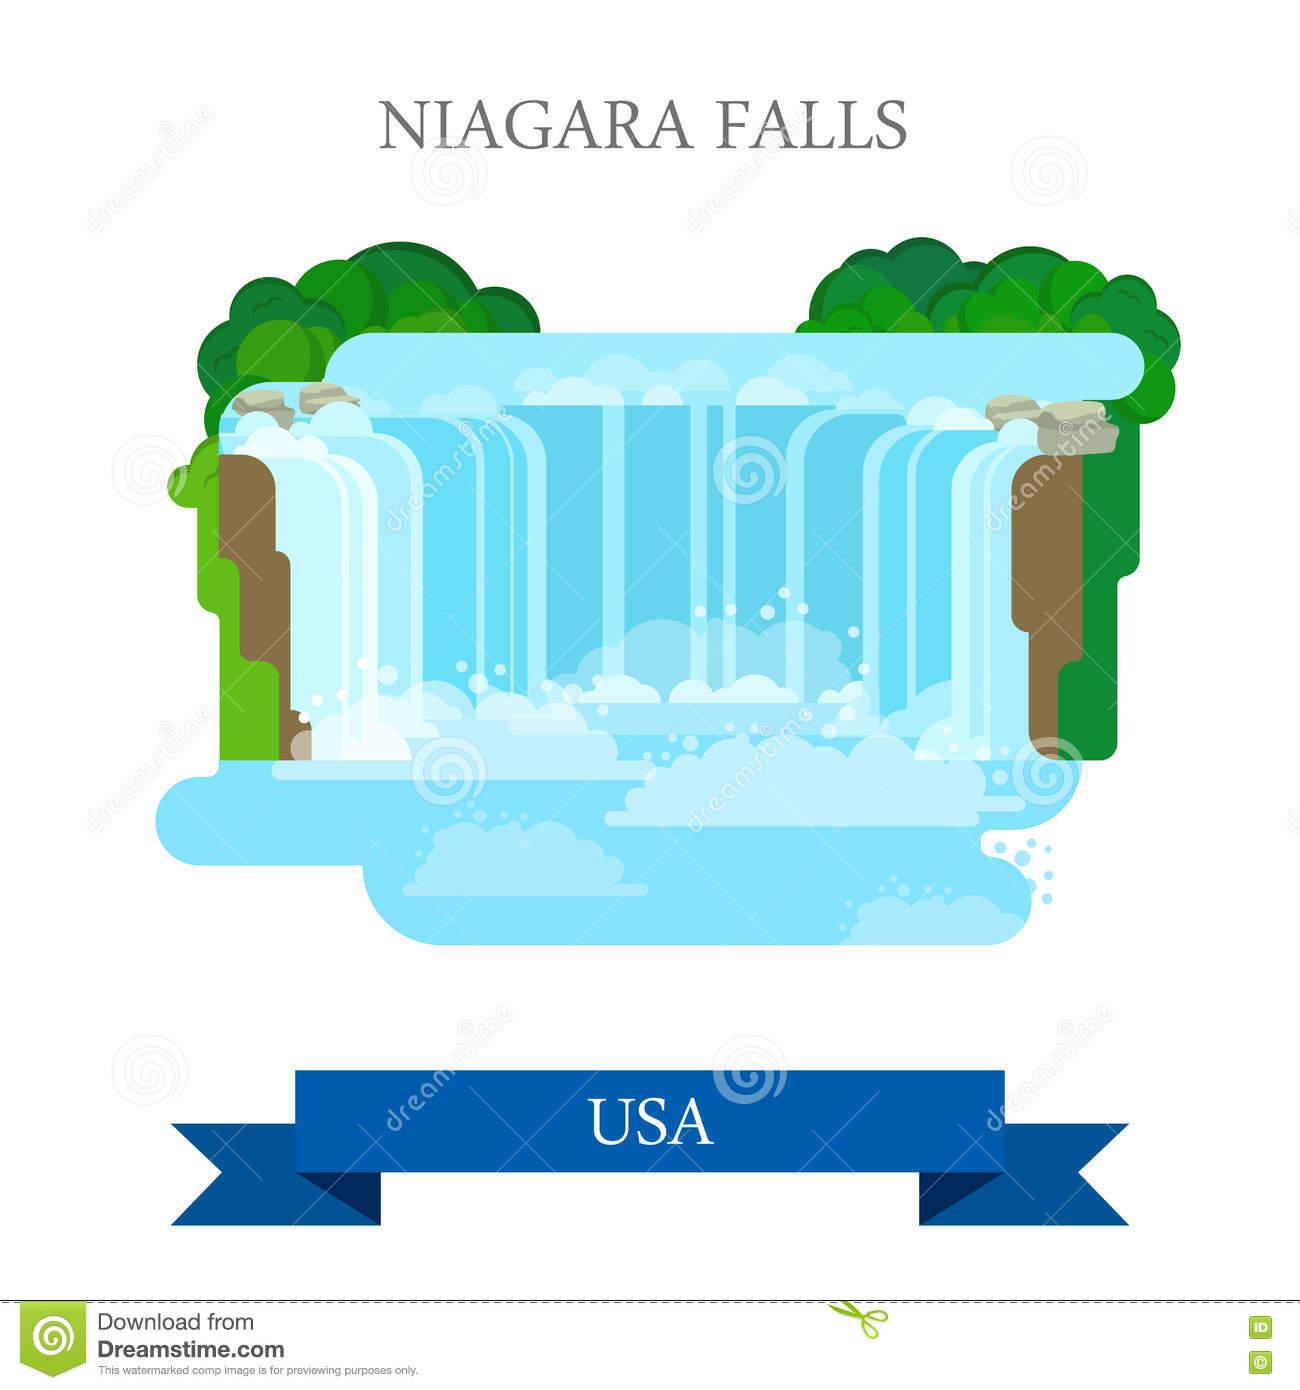 Niagara Falls clipart #18, Download drawings